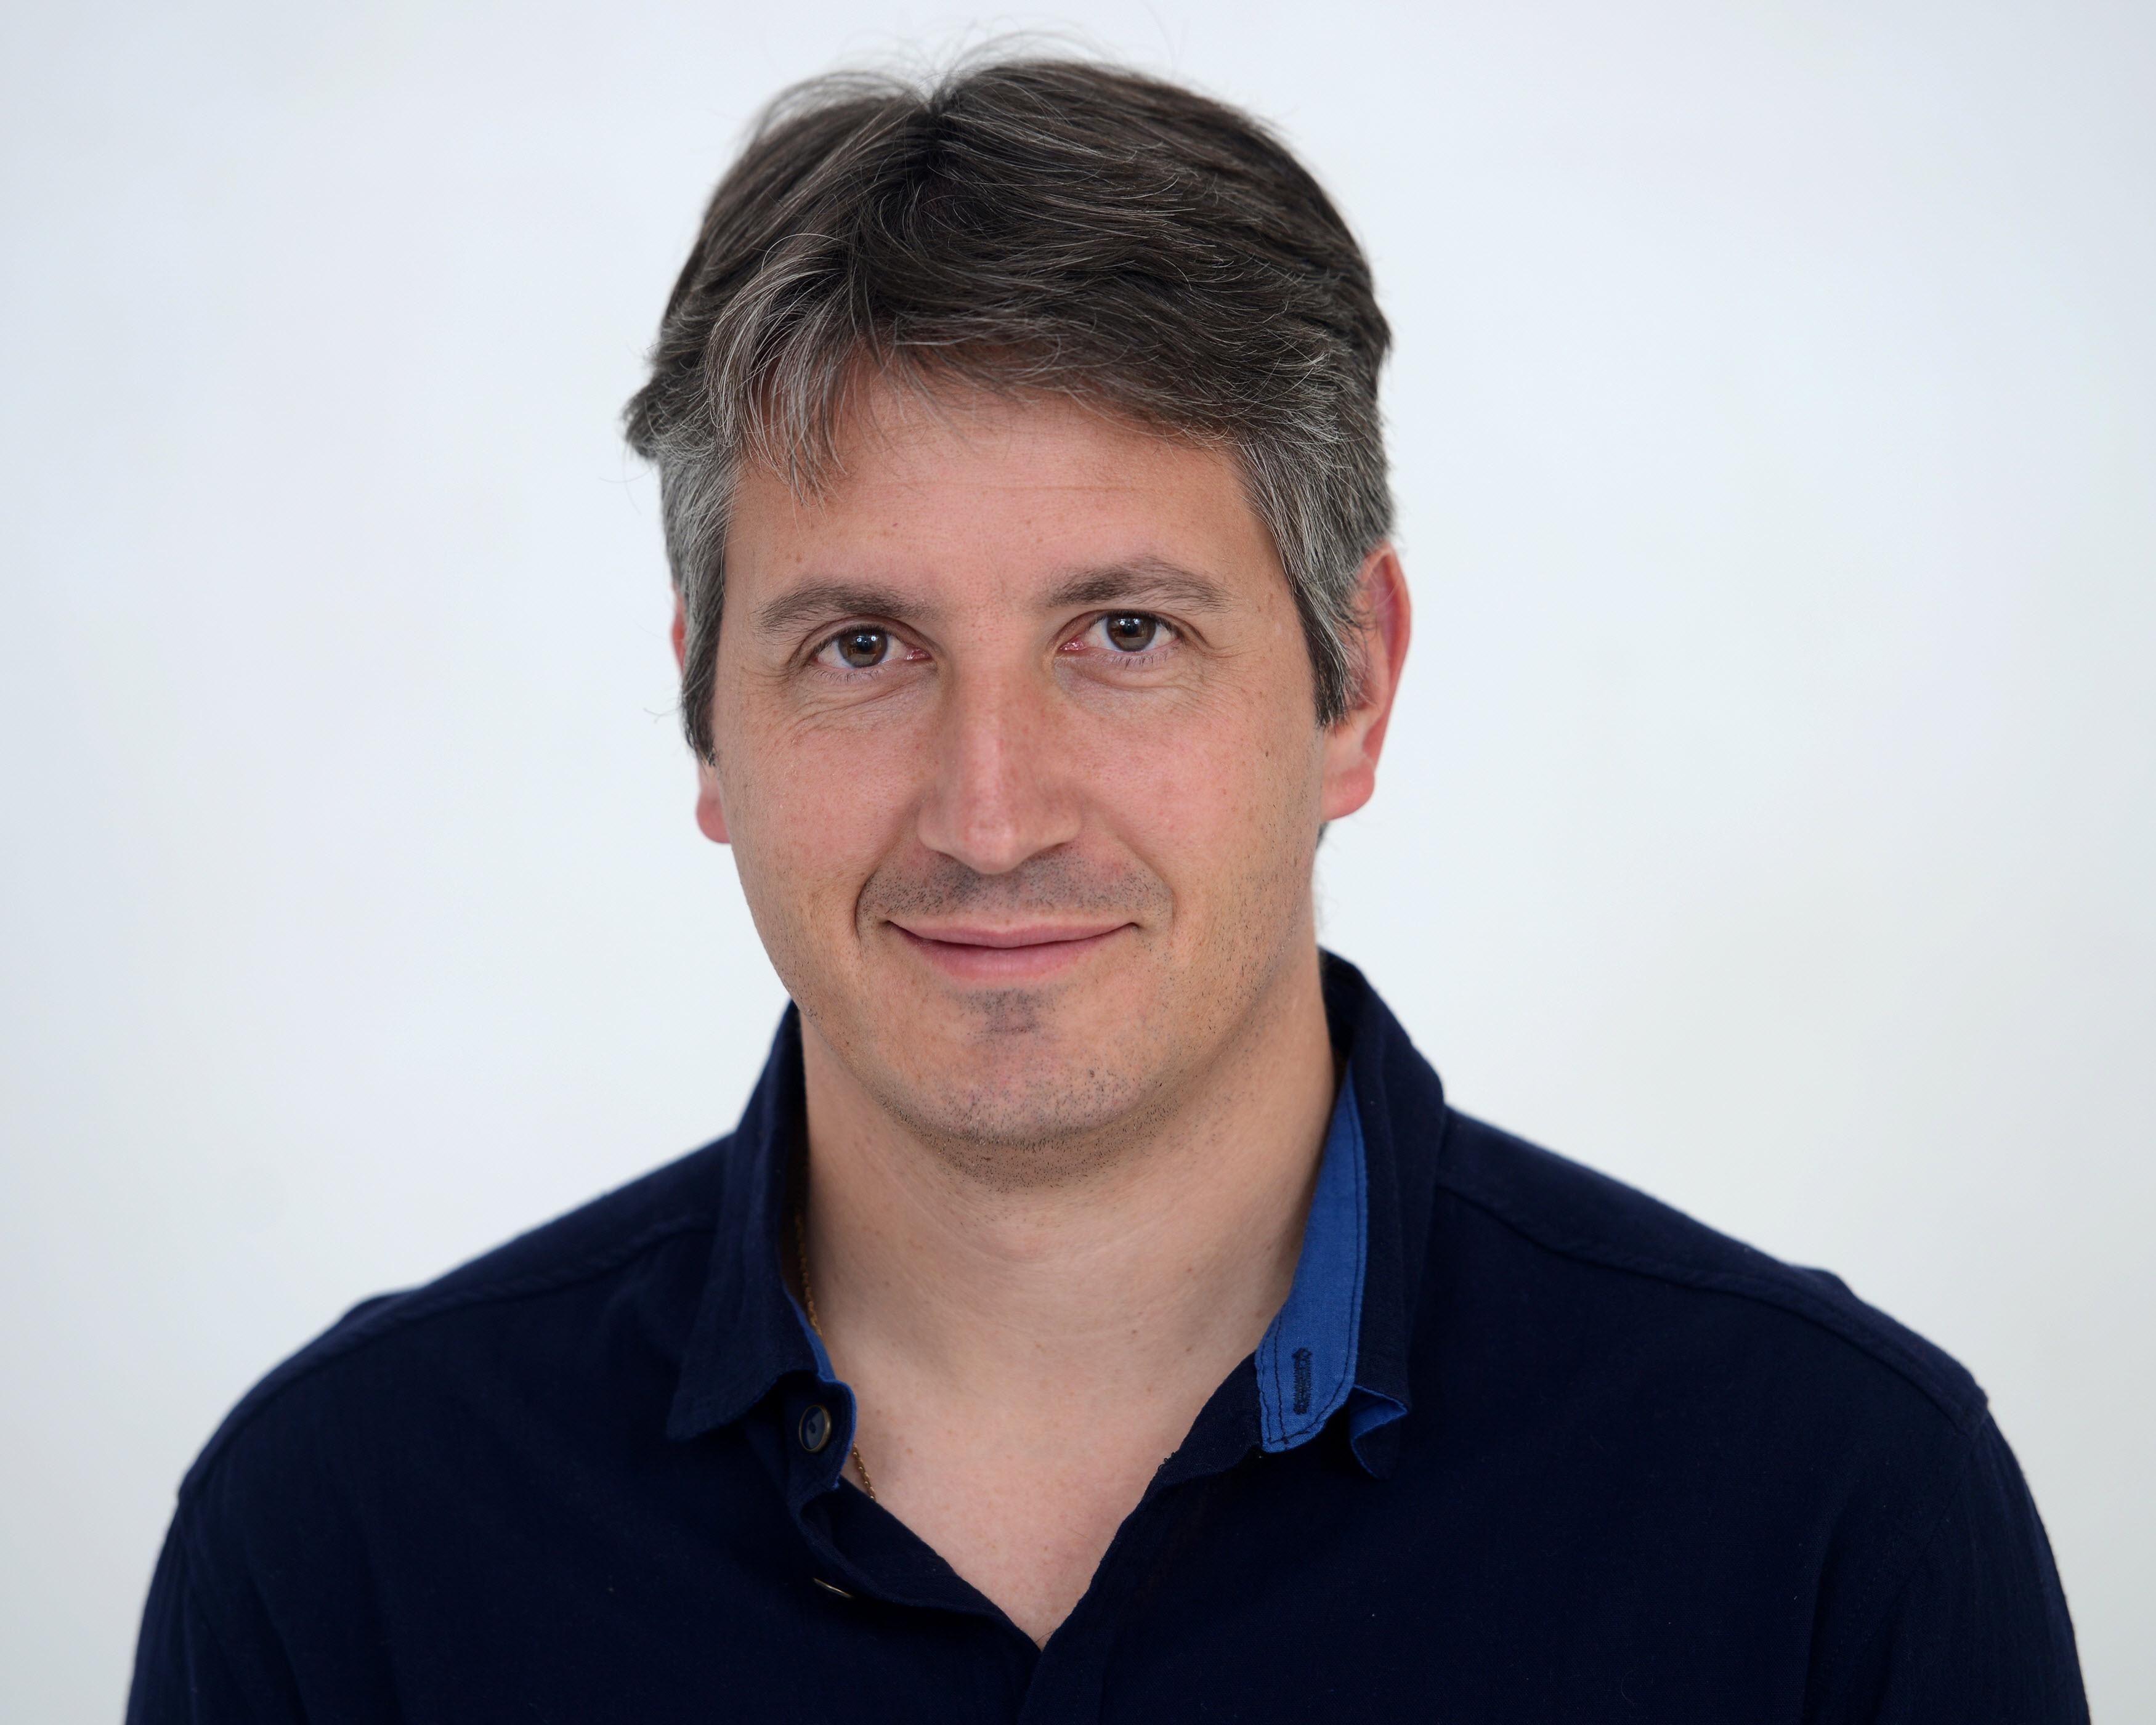 Adrian Miric